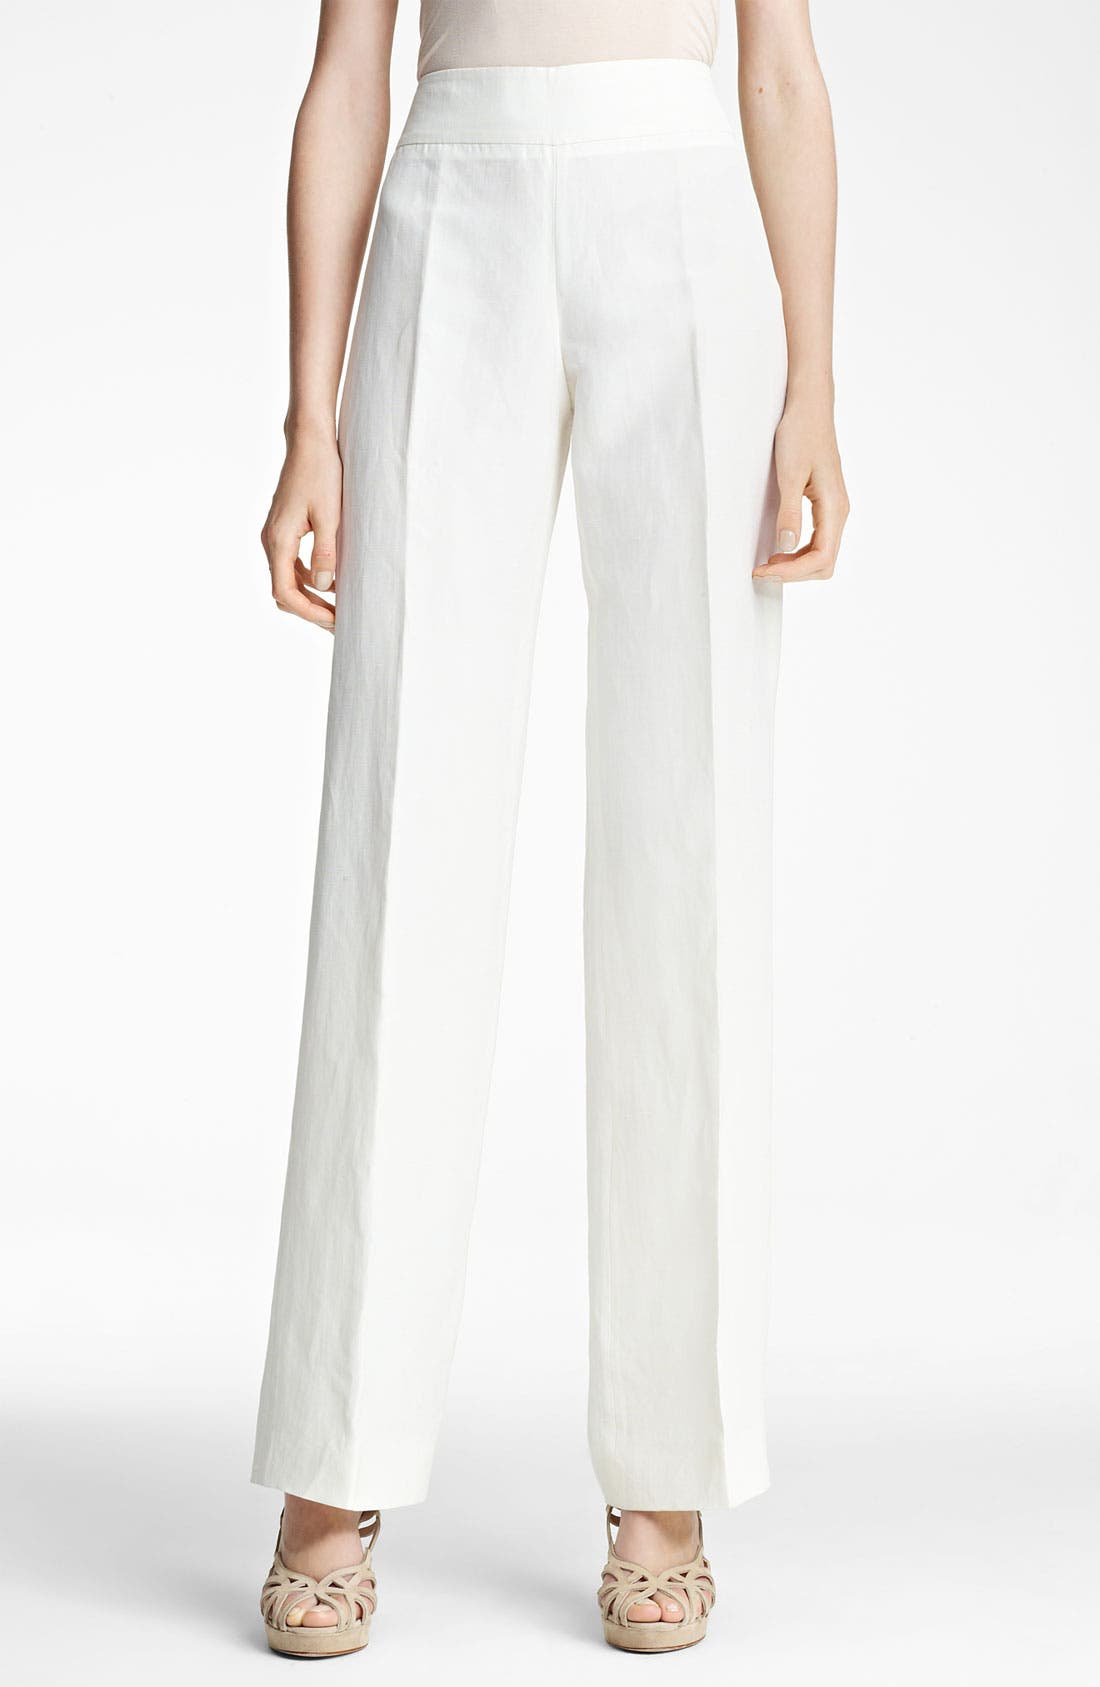 Alternate Image 1 Selected - Armani Collezioni Wide Leg Pants